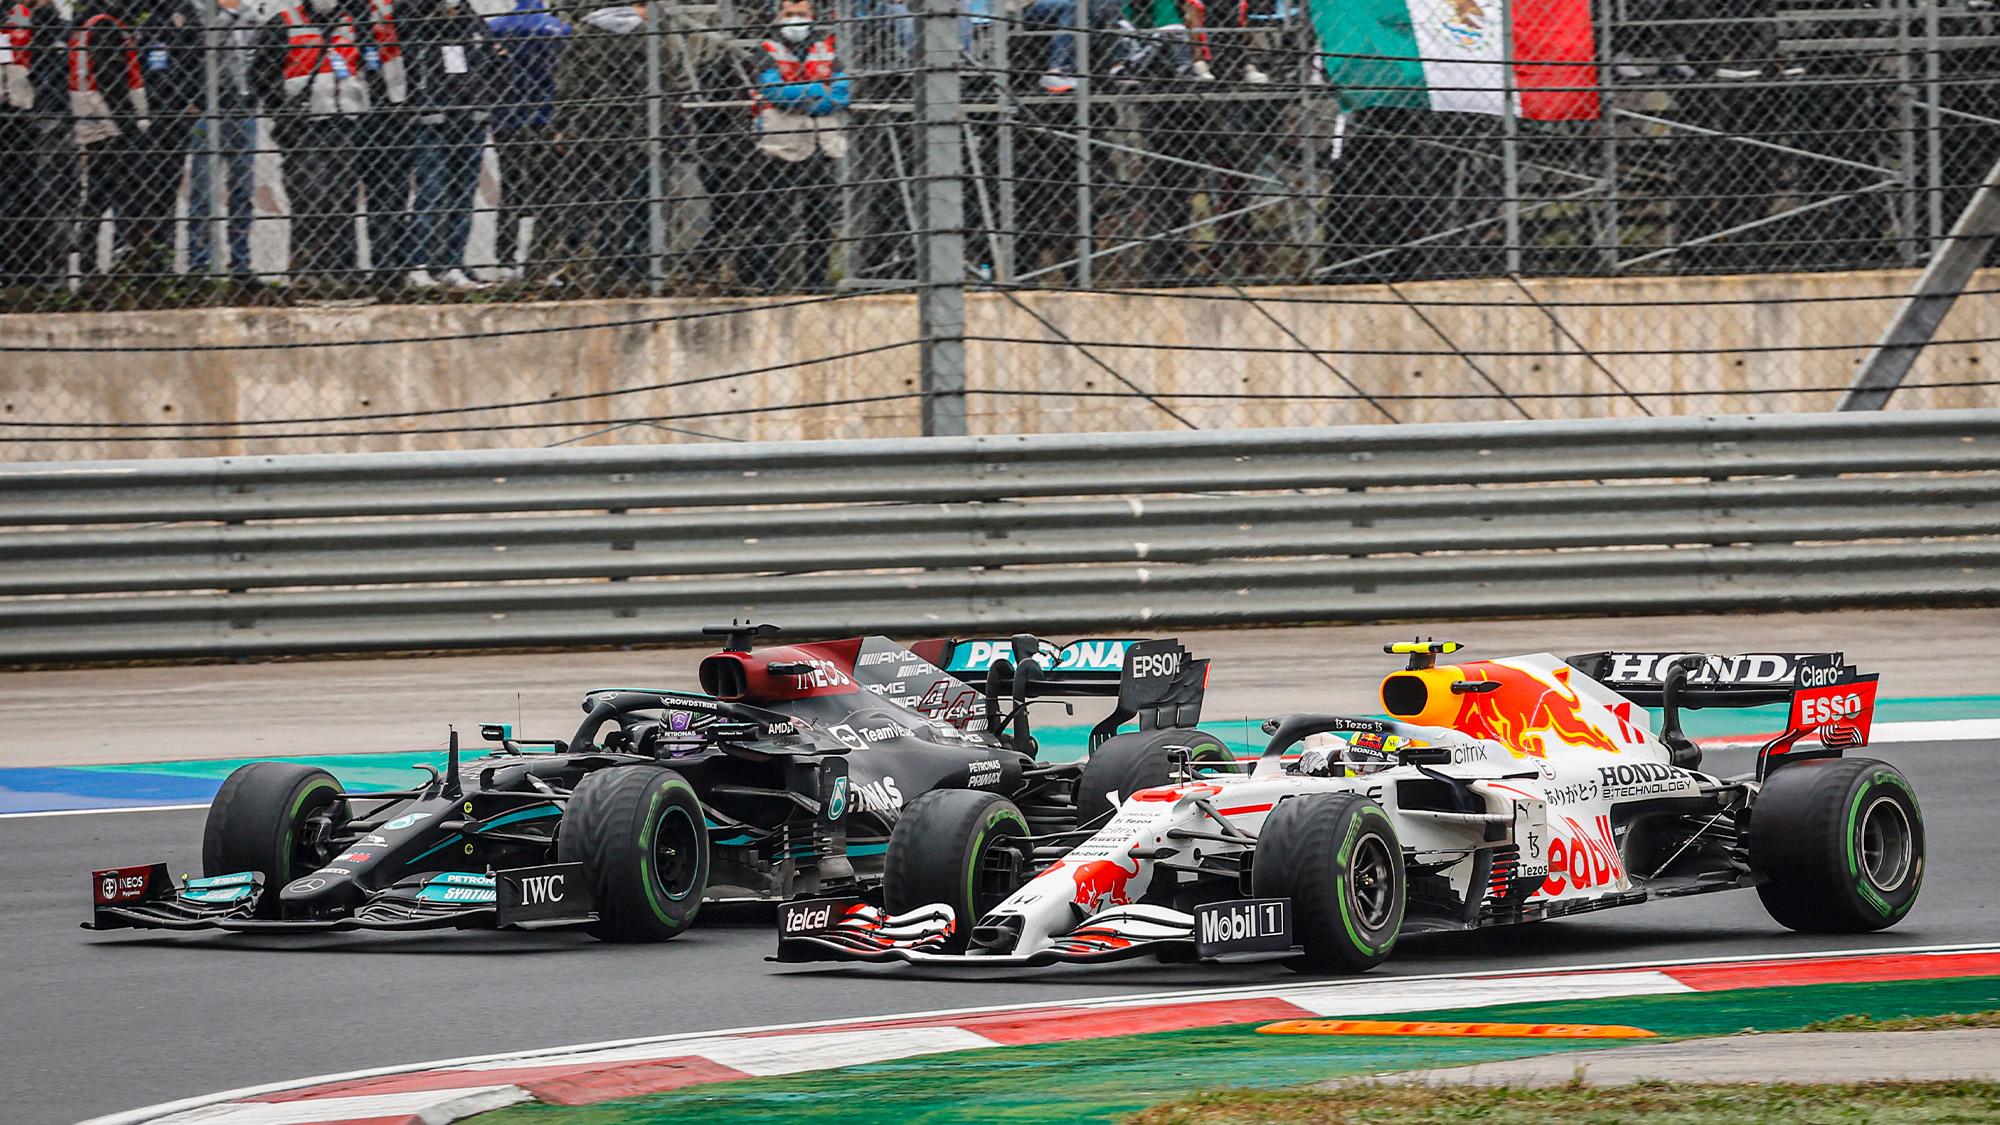 Lewis Hamilton fights with Sergio Perez at the 2021 Turkish Grand Prix